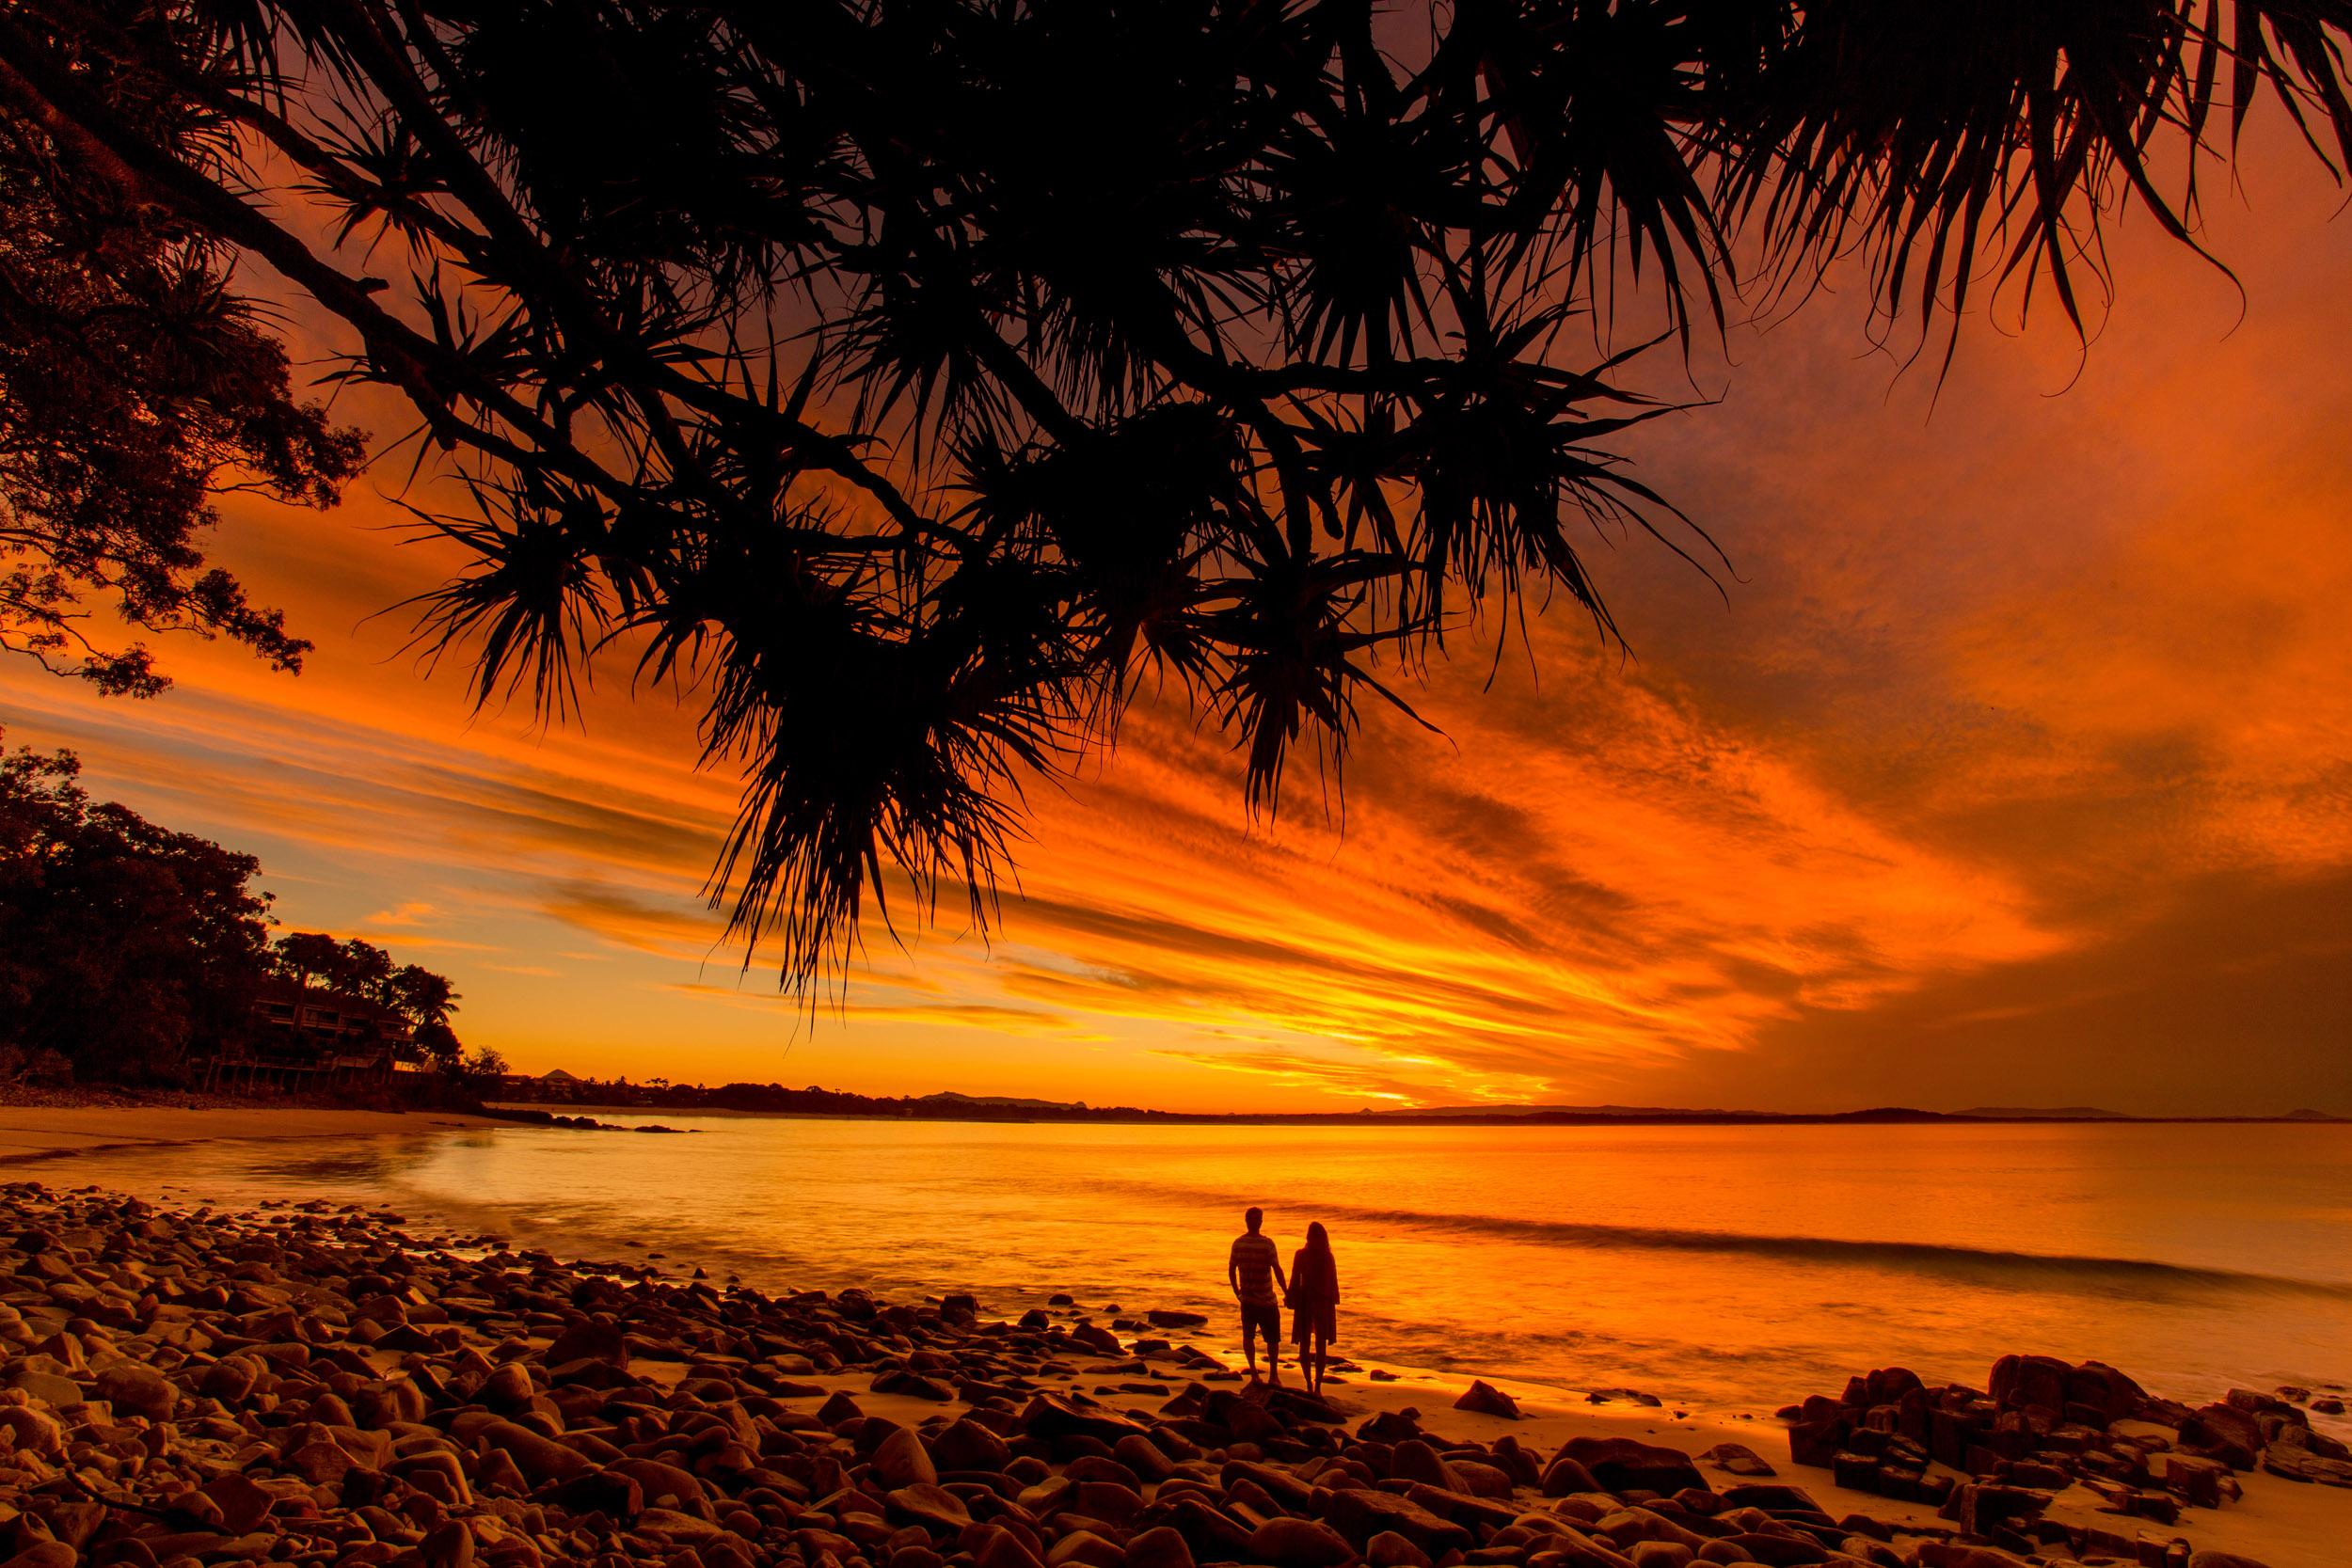 little-cove-noosa-heads-sunset-pandanus-trees.jpg